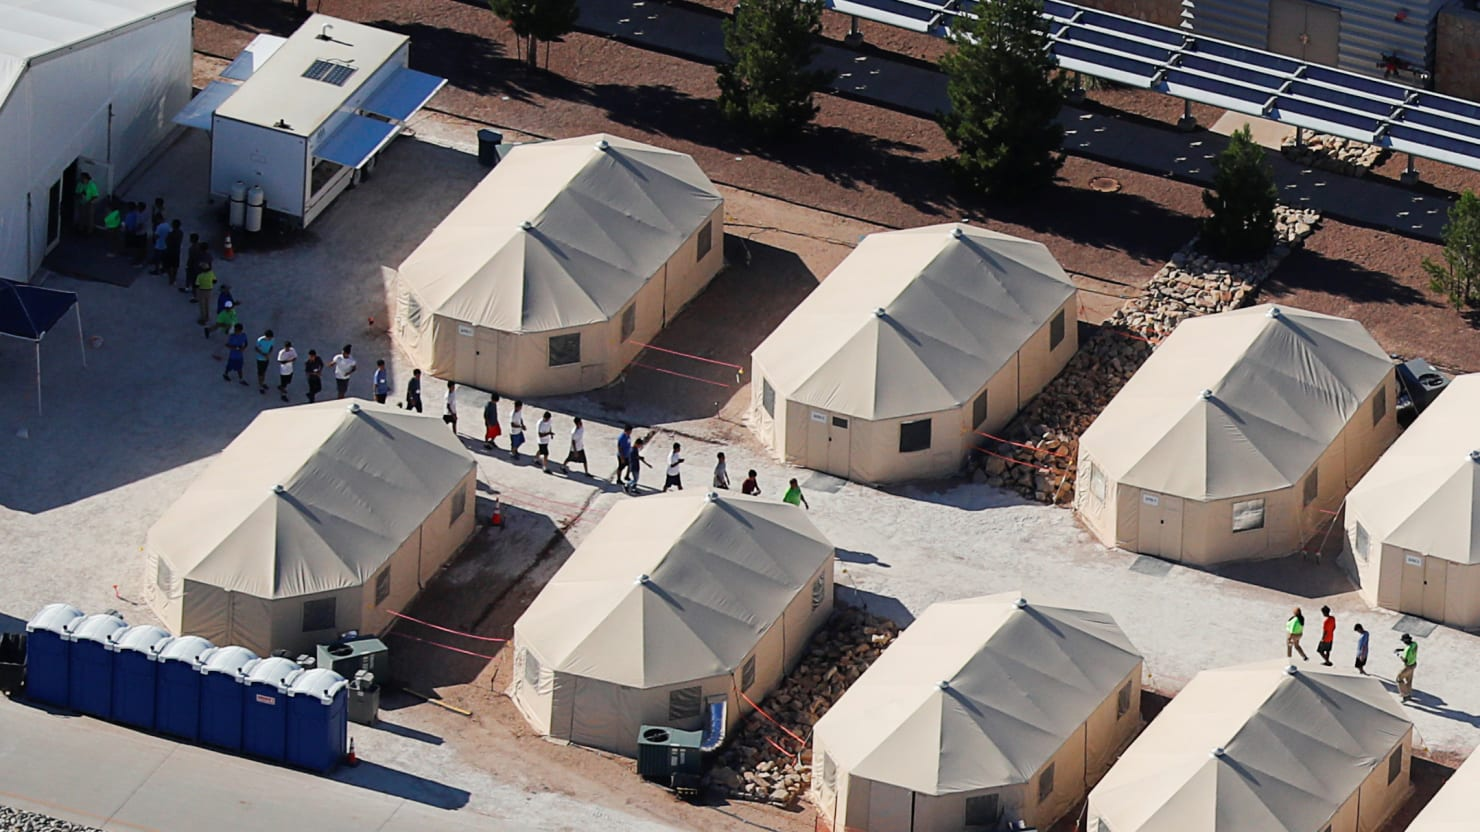 Nonprofit Execs Rake in Cash From Child Detention Center Funding